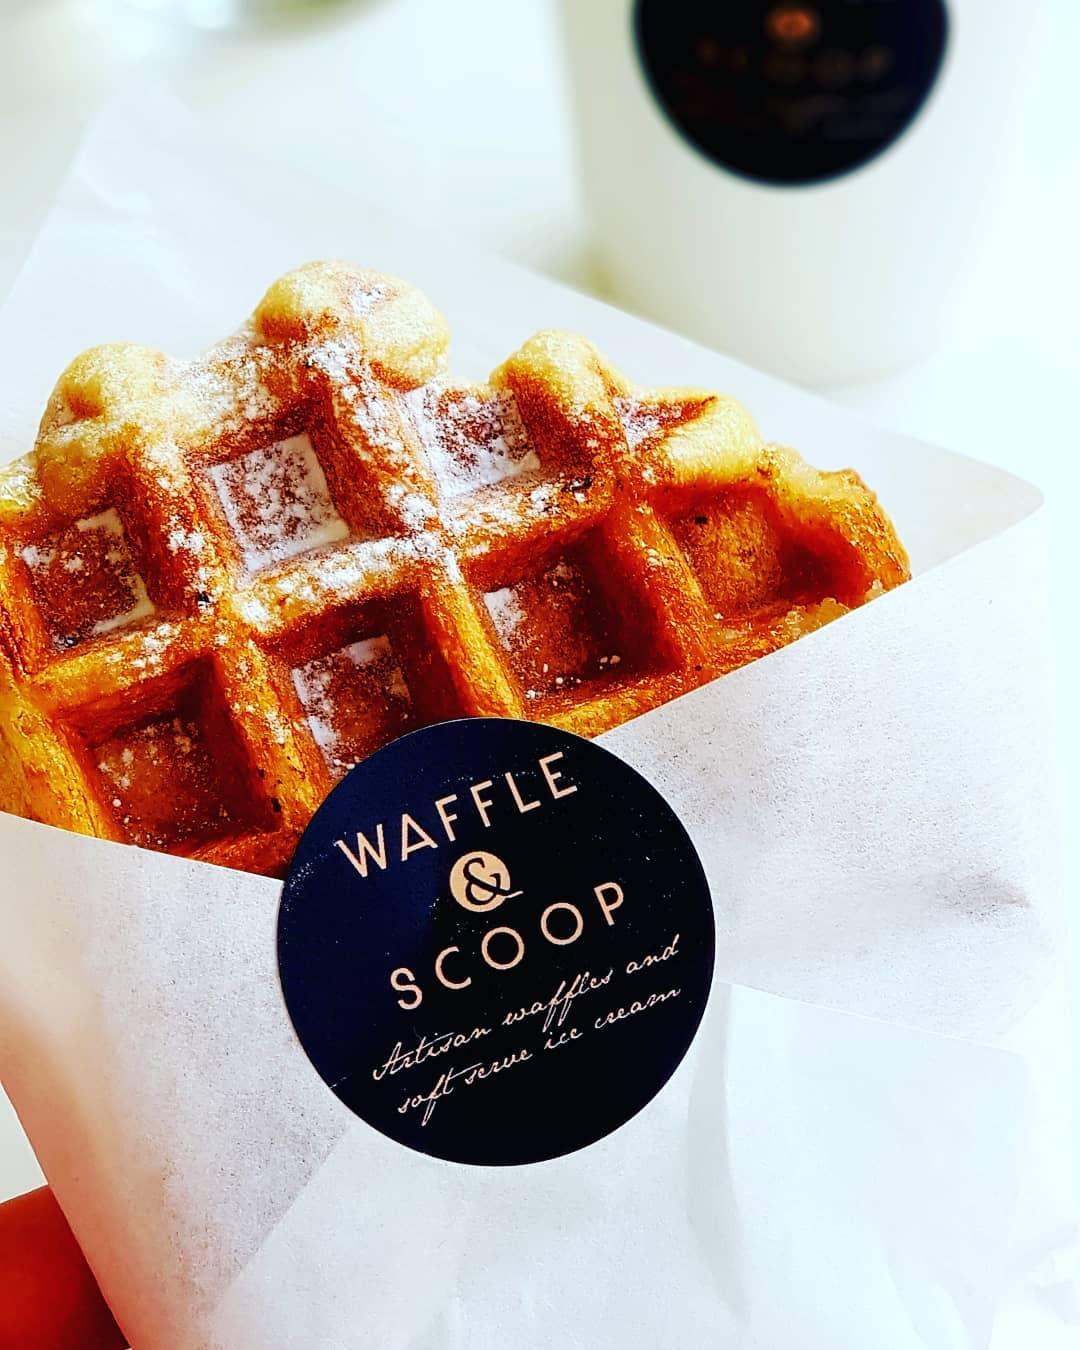 Liege Waffle in a wrap